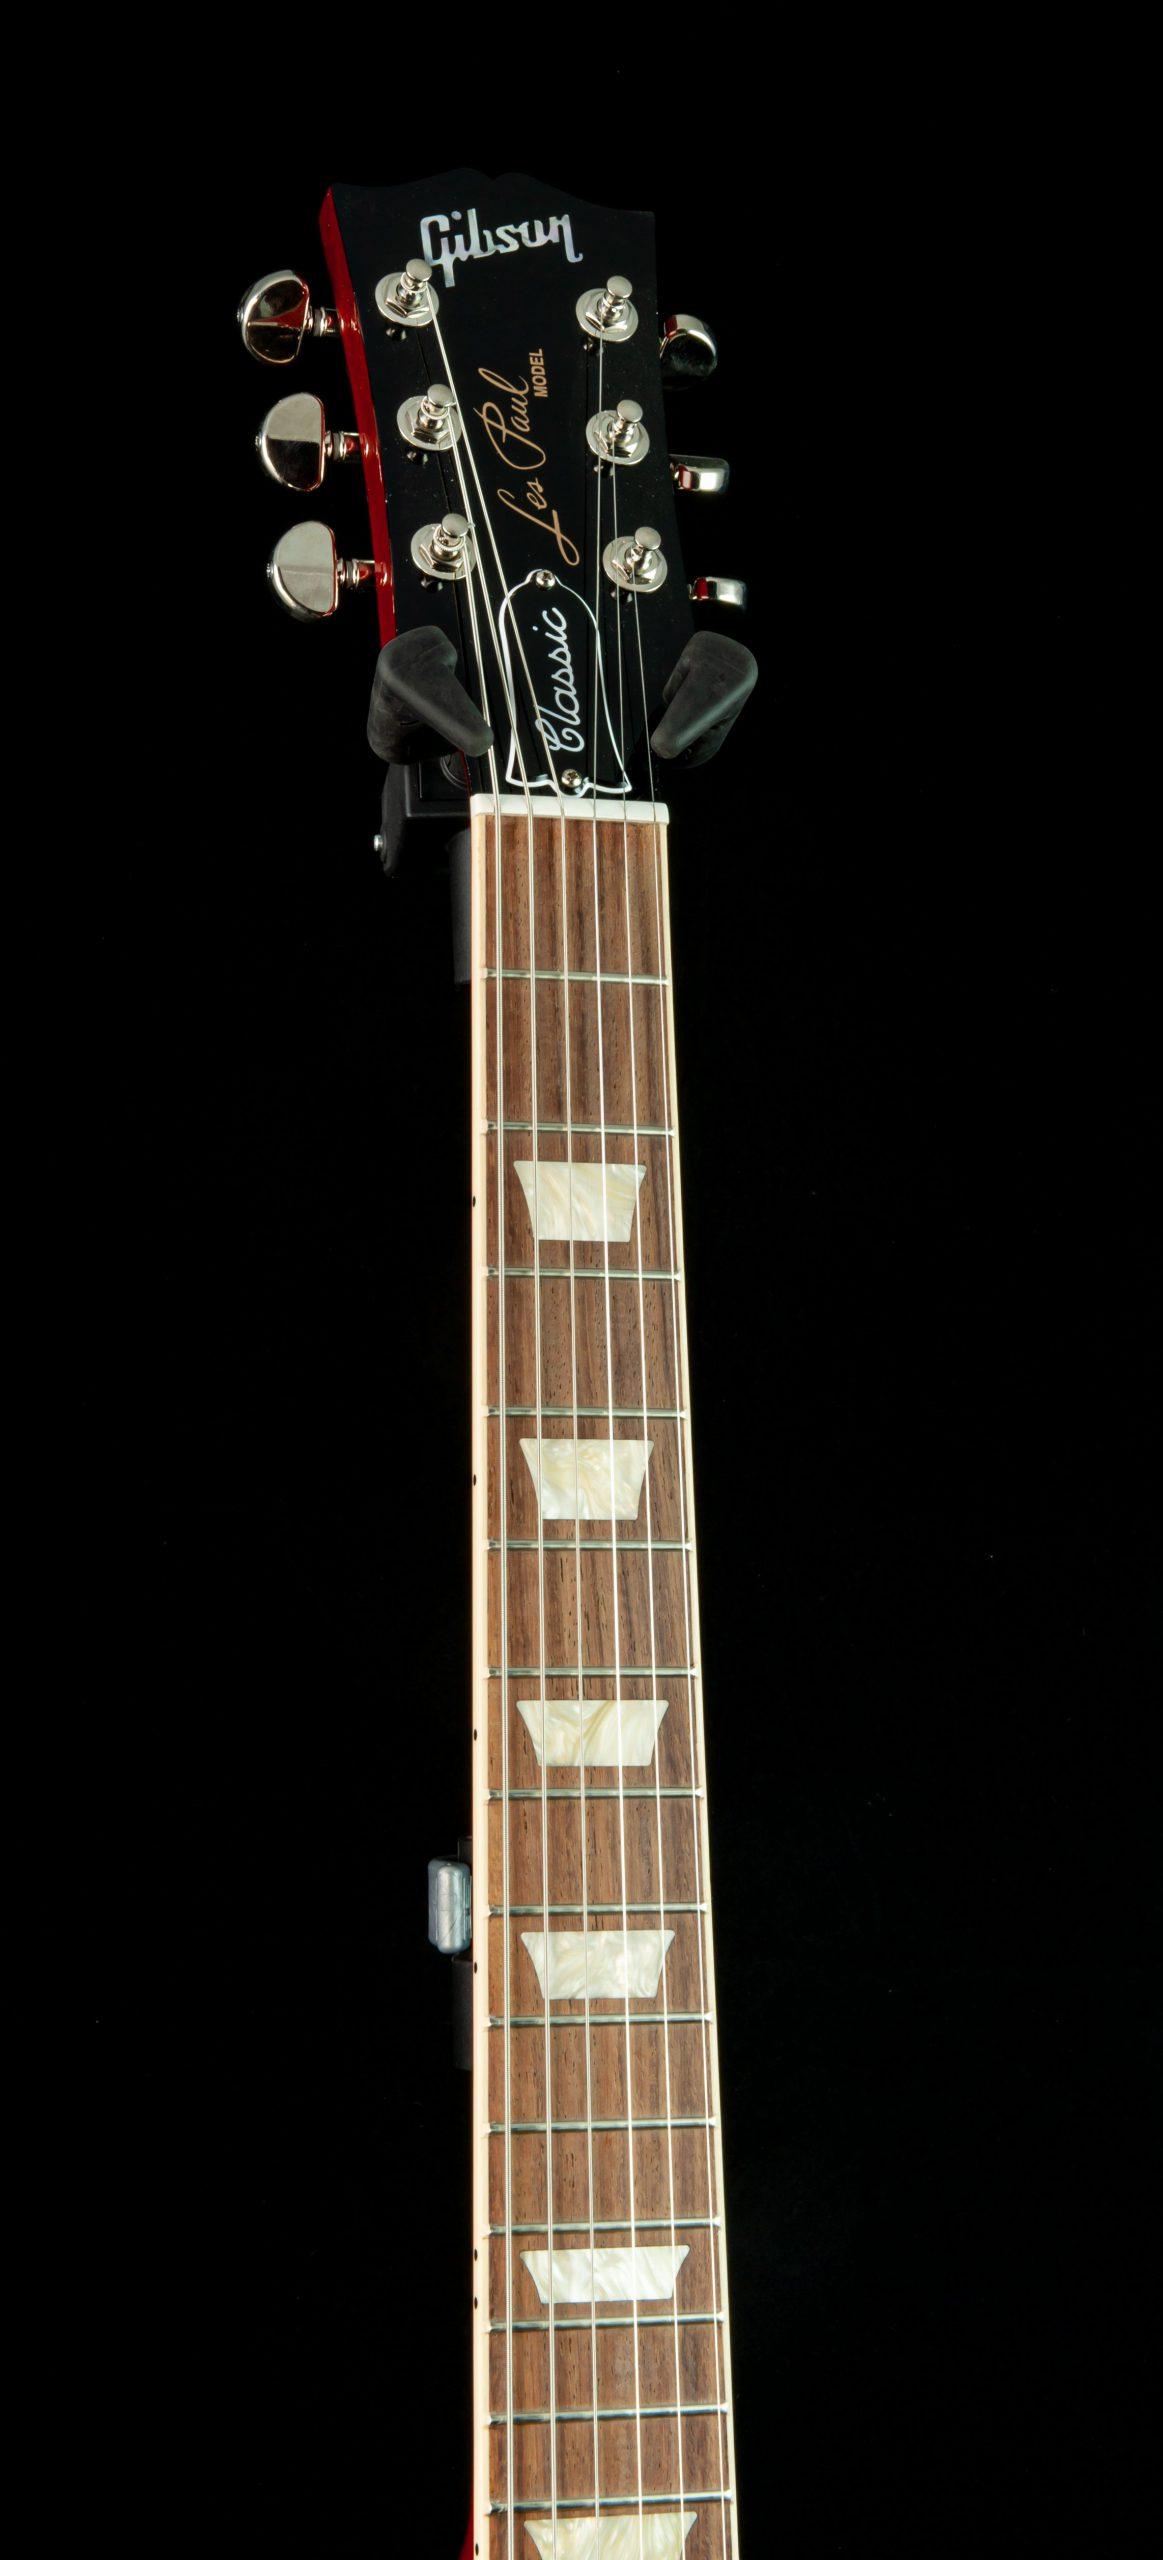 Gibson Les Paul Classic in Heritage Cherry Sunburst